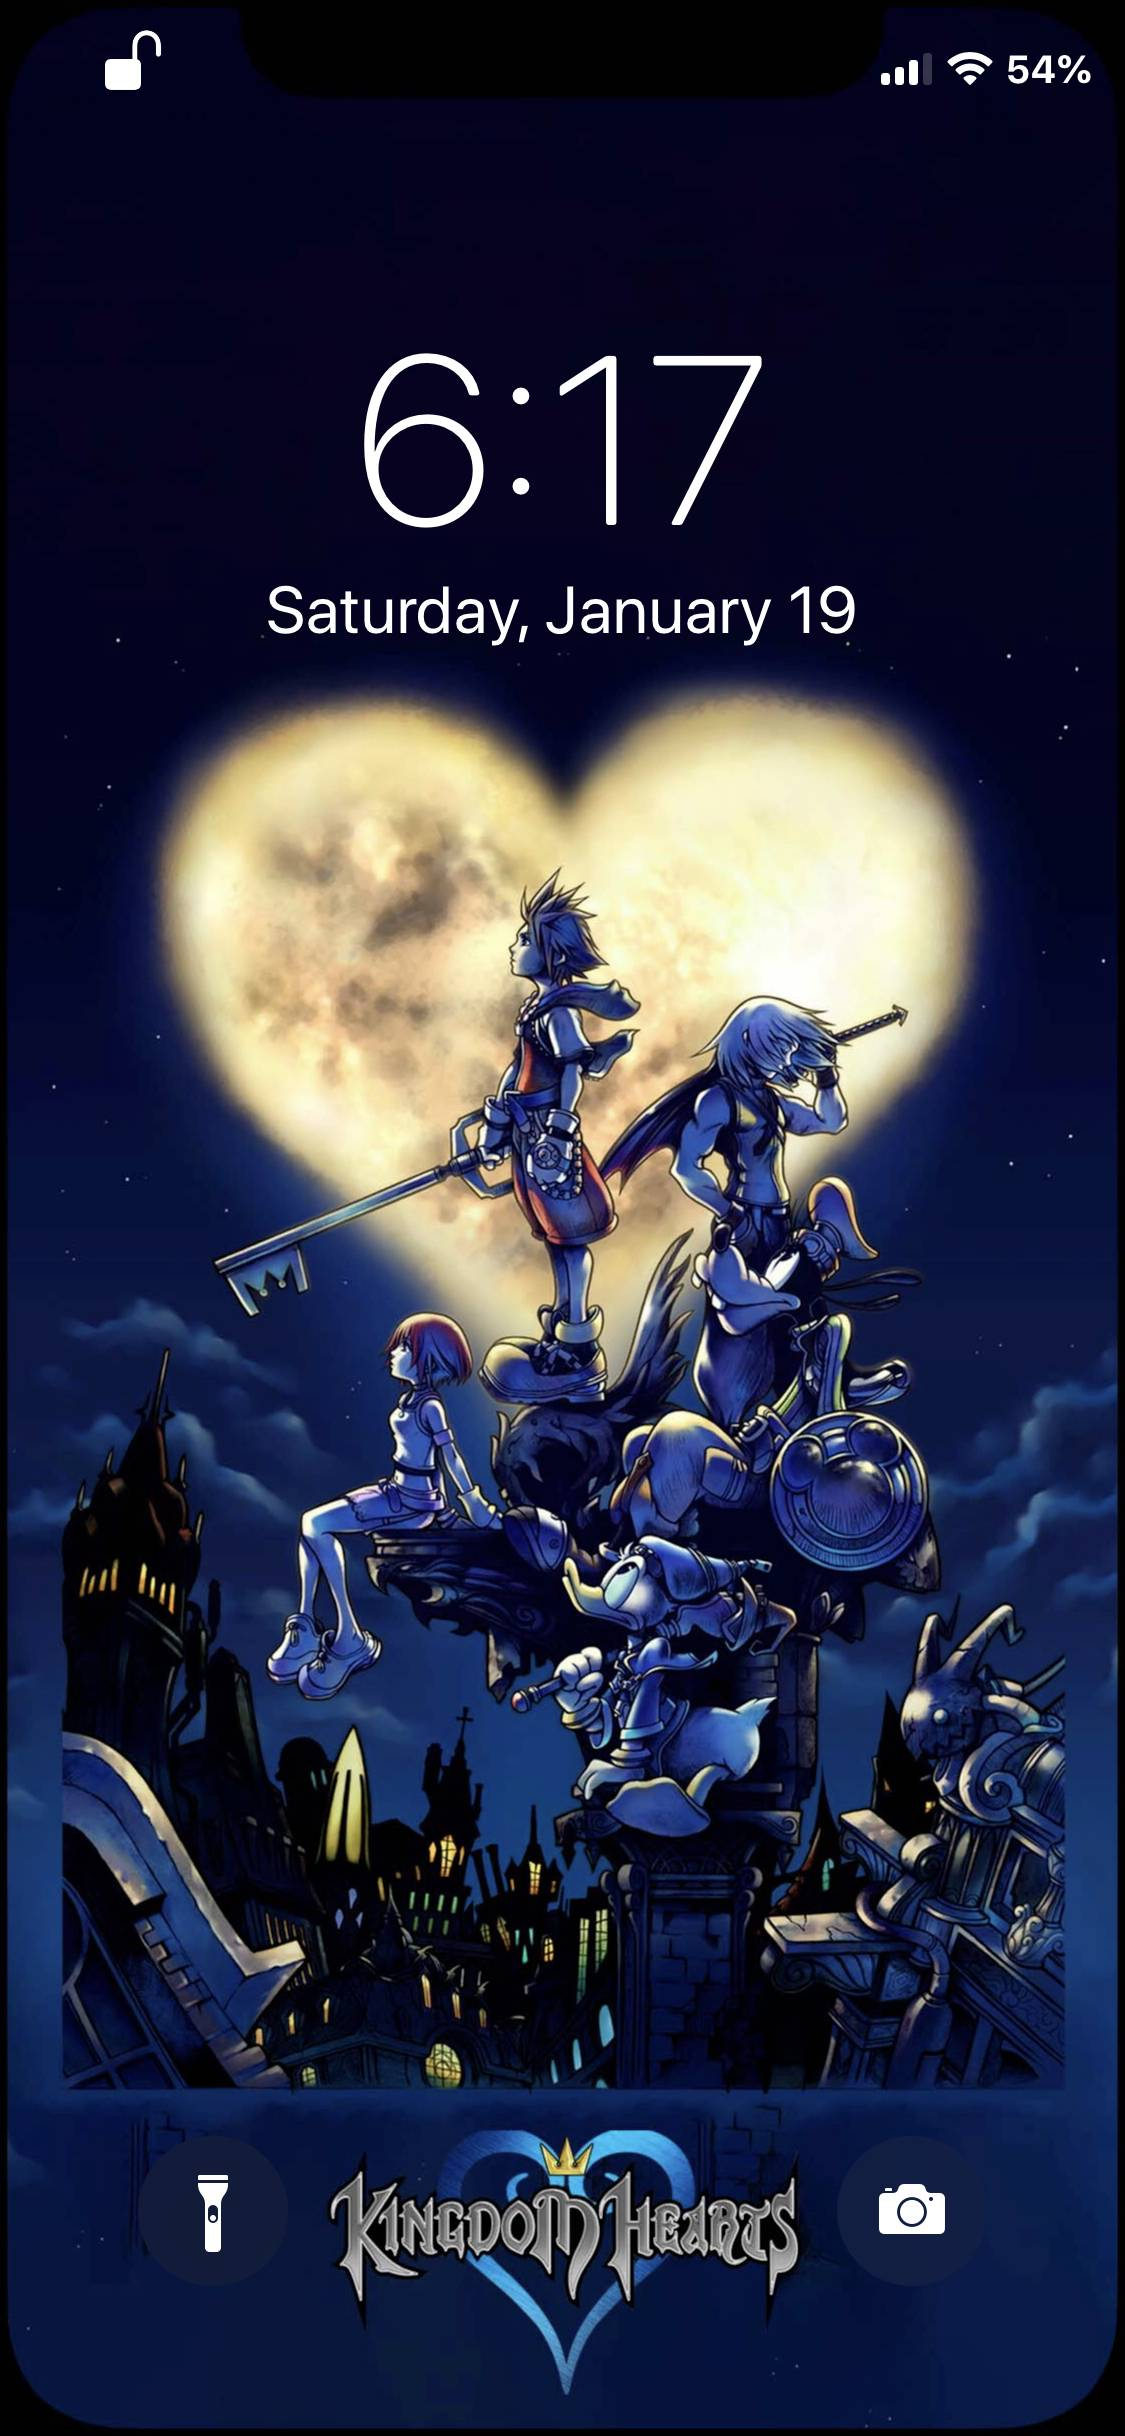 [media] Kingdom Hearts Wallpaper For Iphone X/xs - Kingdom Hearts , HD Wallpaper & Backgrounds